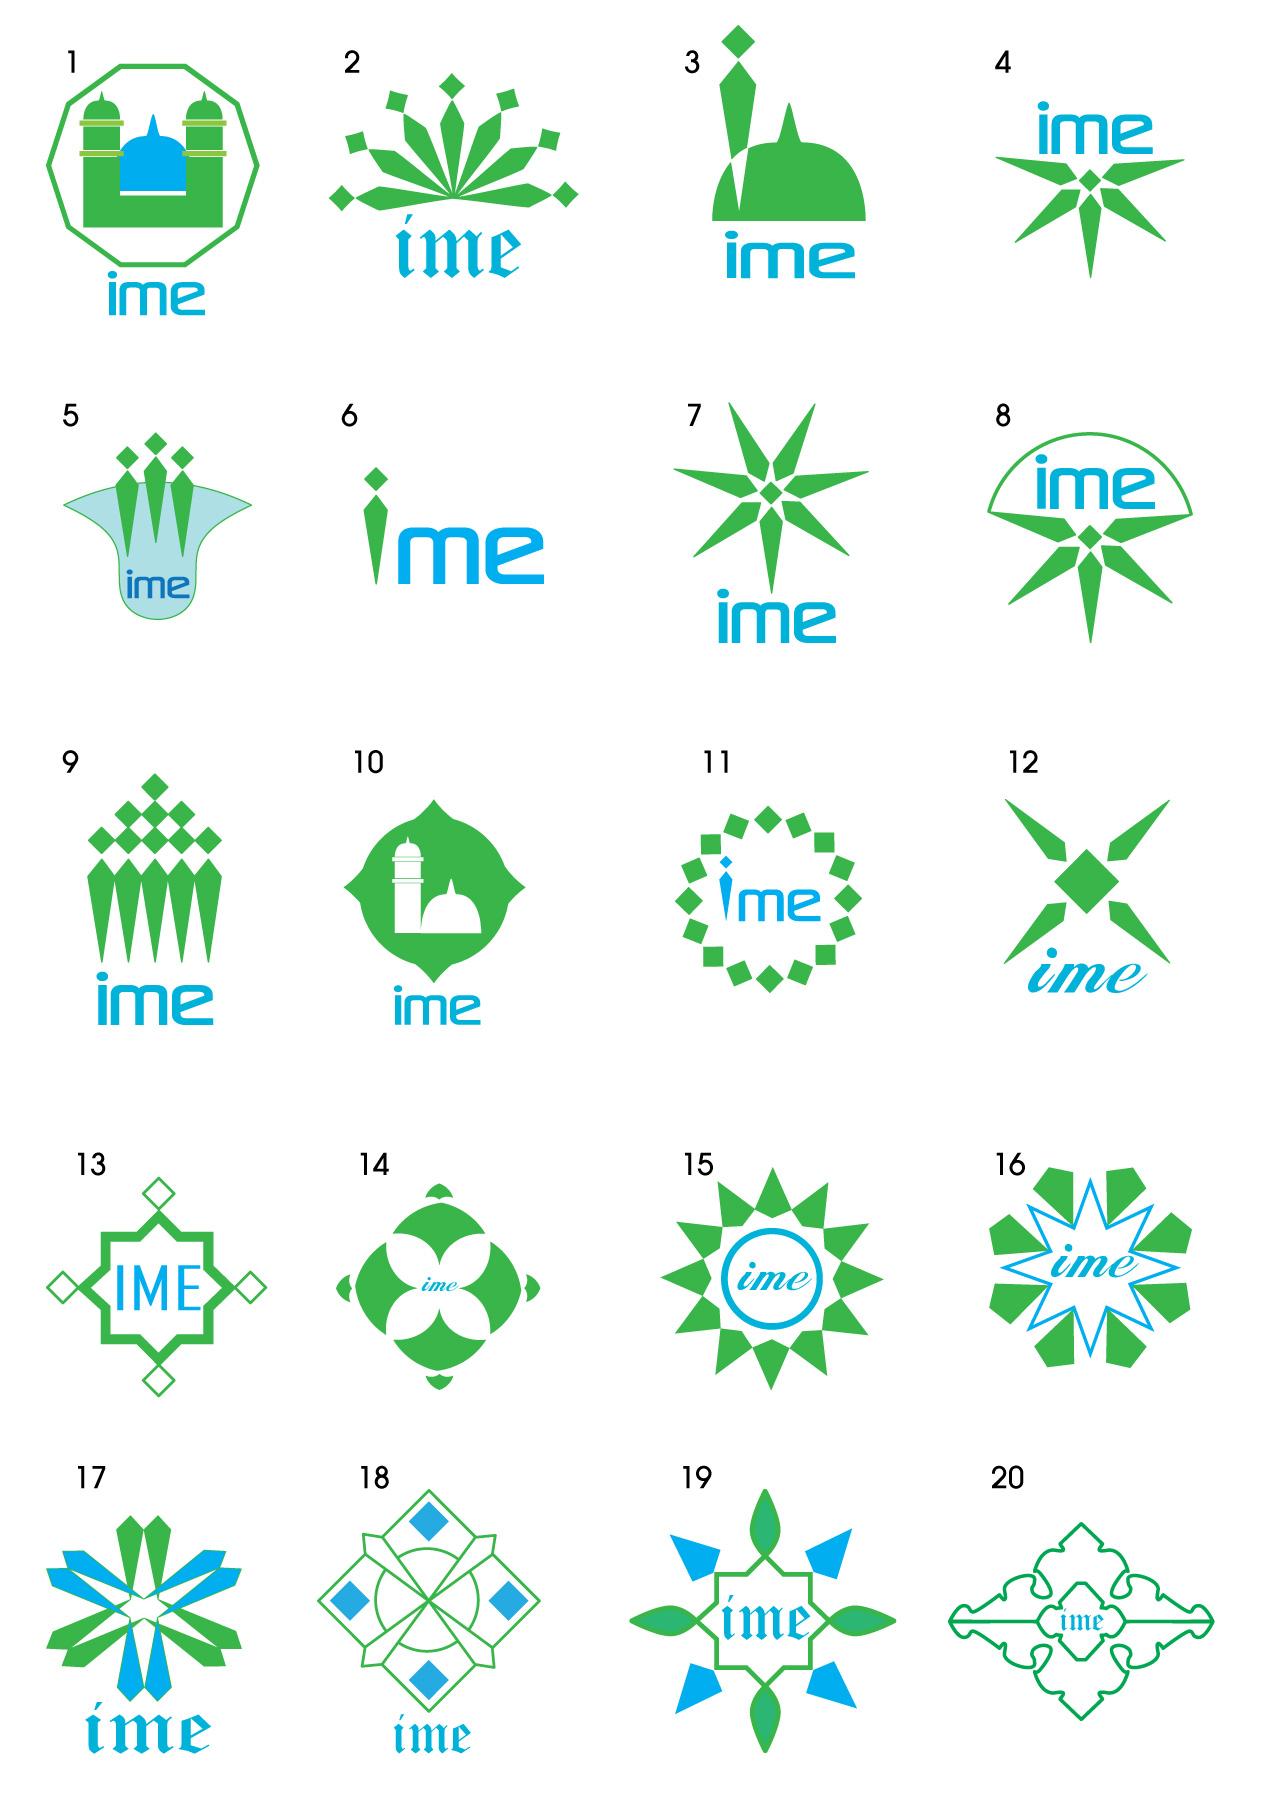 طراحی لوگو|سایت طراحی لوگو| تعرفه طراحی لوگو | design logos ...برچسبها: لوگو, آرم, لوگو نمونه, طراحی آرم, نشانه, طراحی نشانه